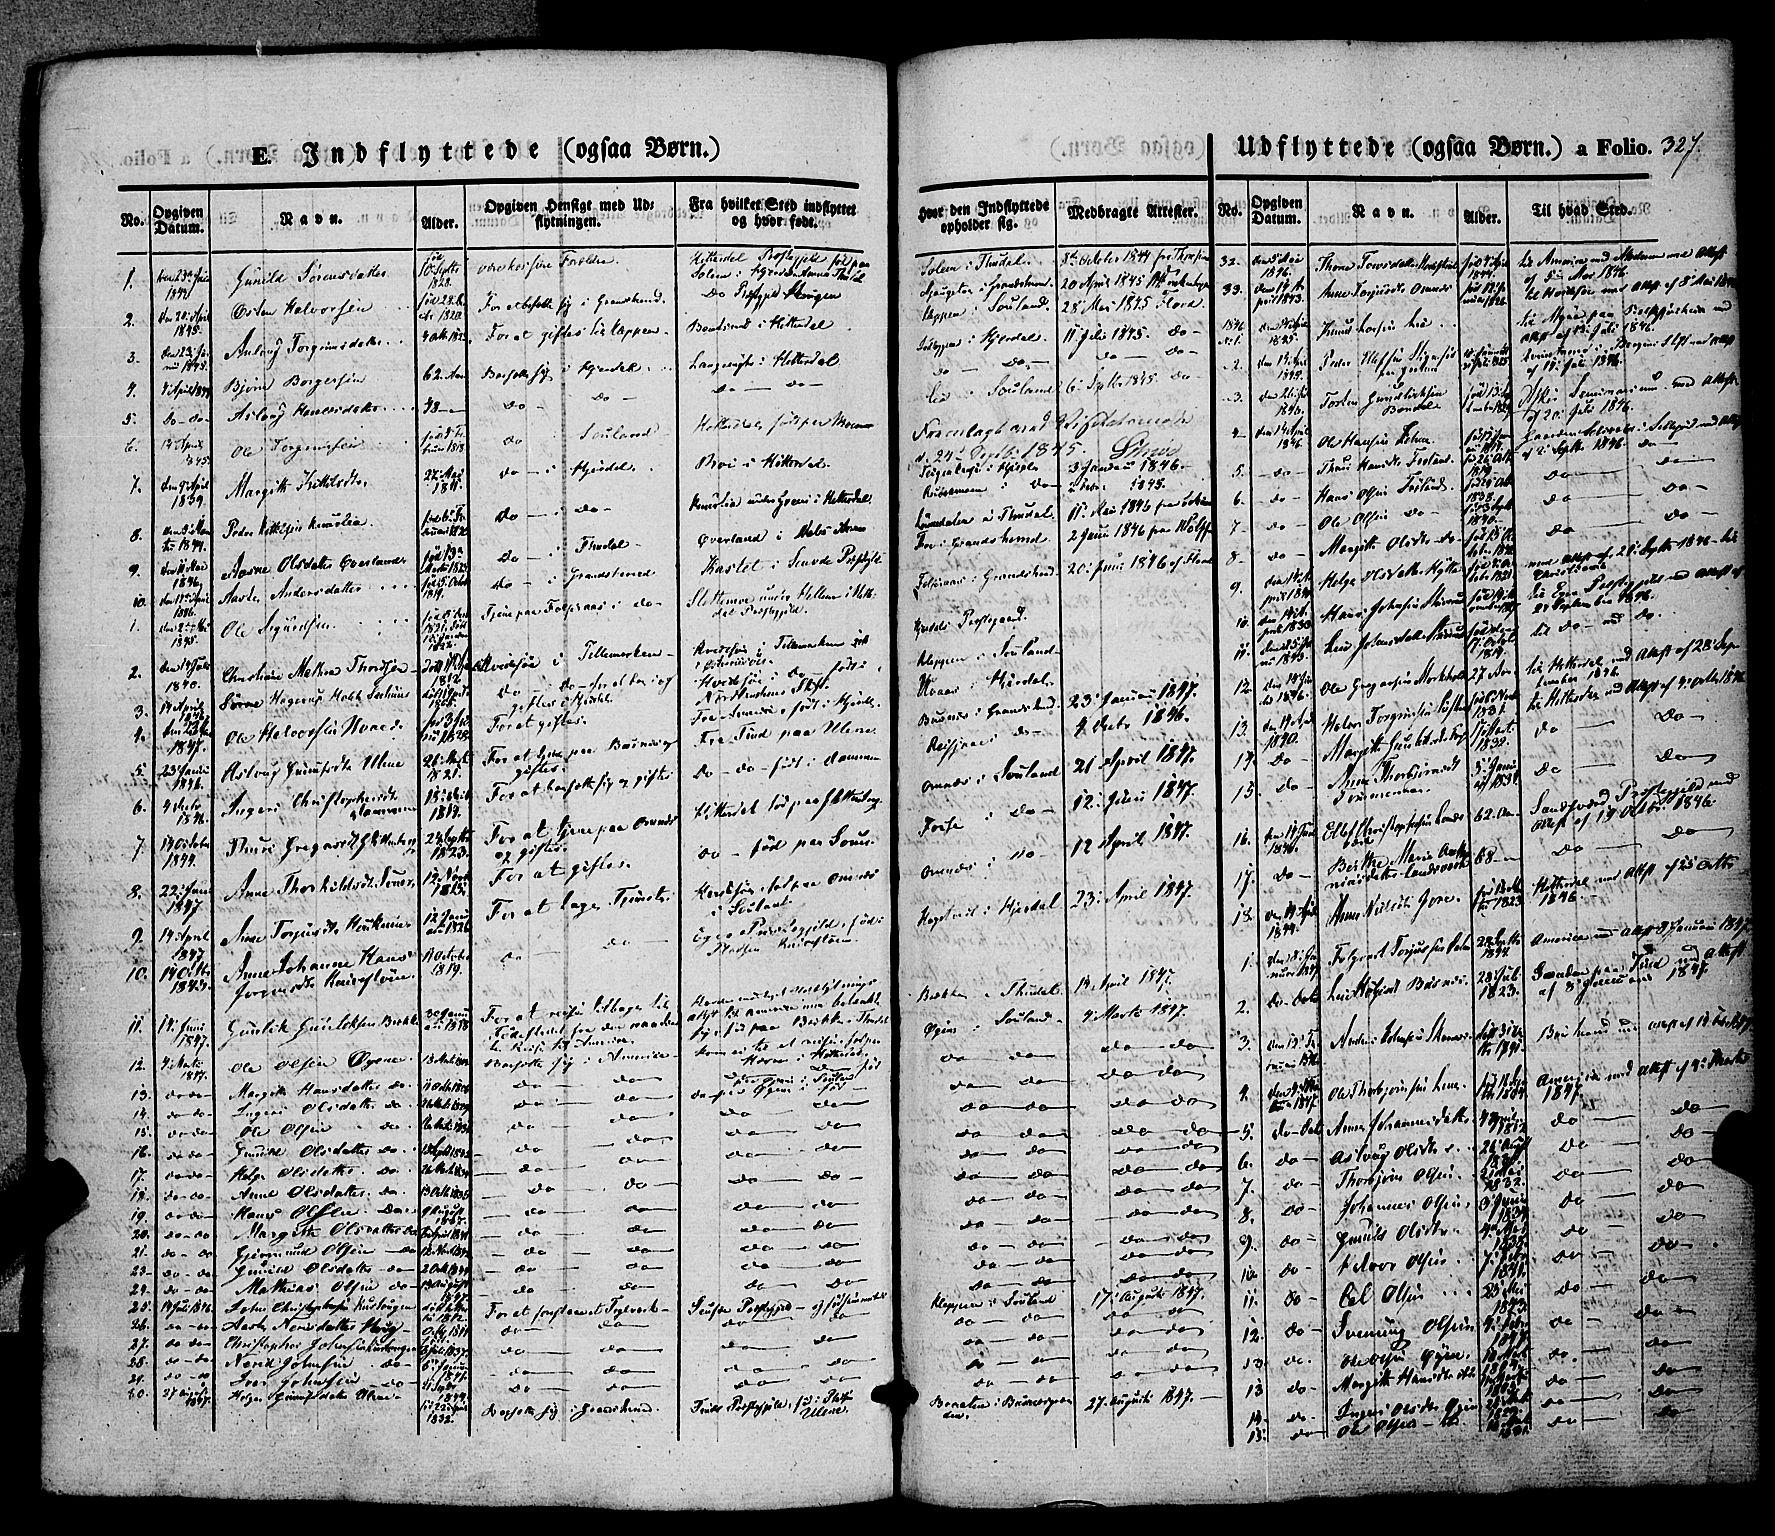 SAKO, Hjartdal kirkebøker, F/Fa/L0008: Ministerialbok nr. I 8, 1844-1859, s. 327